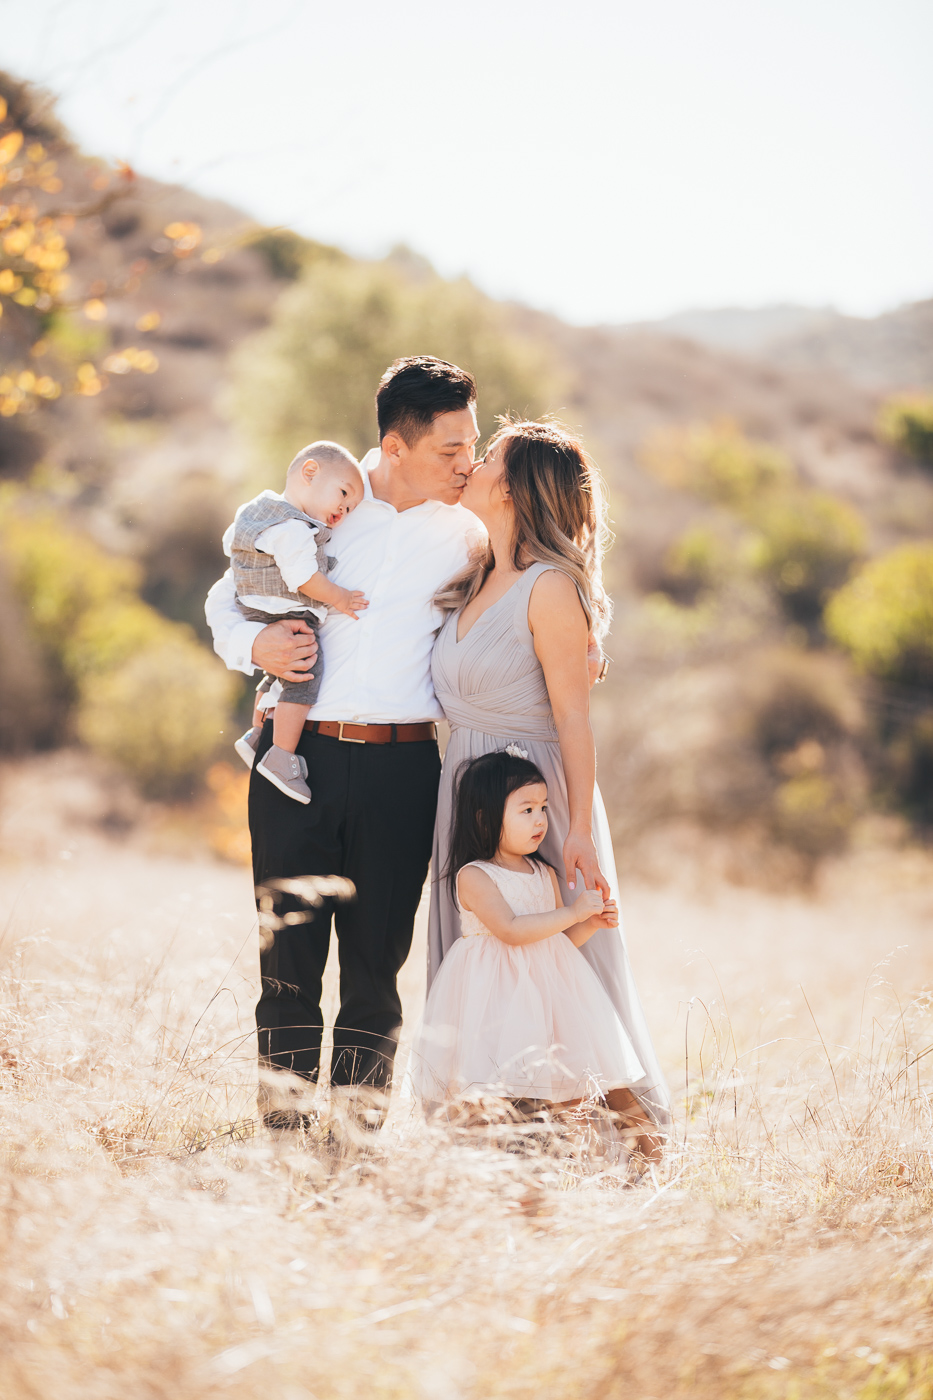 2016.11.29_Orange_County_Family_Photography 47.jpg